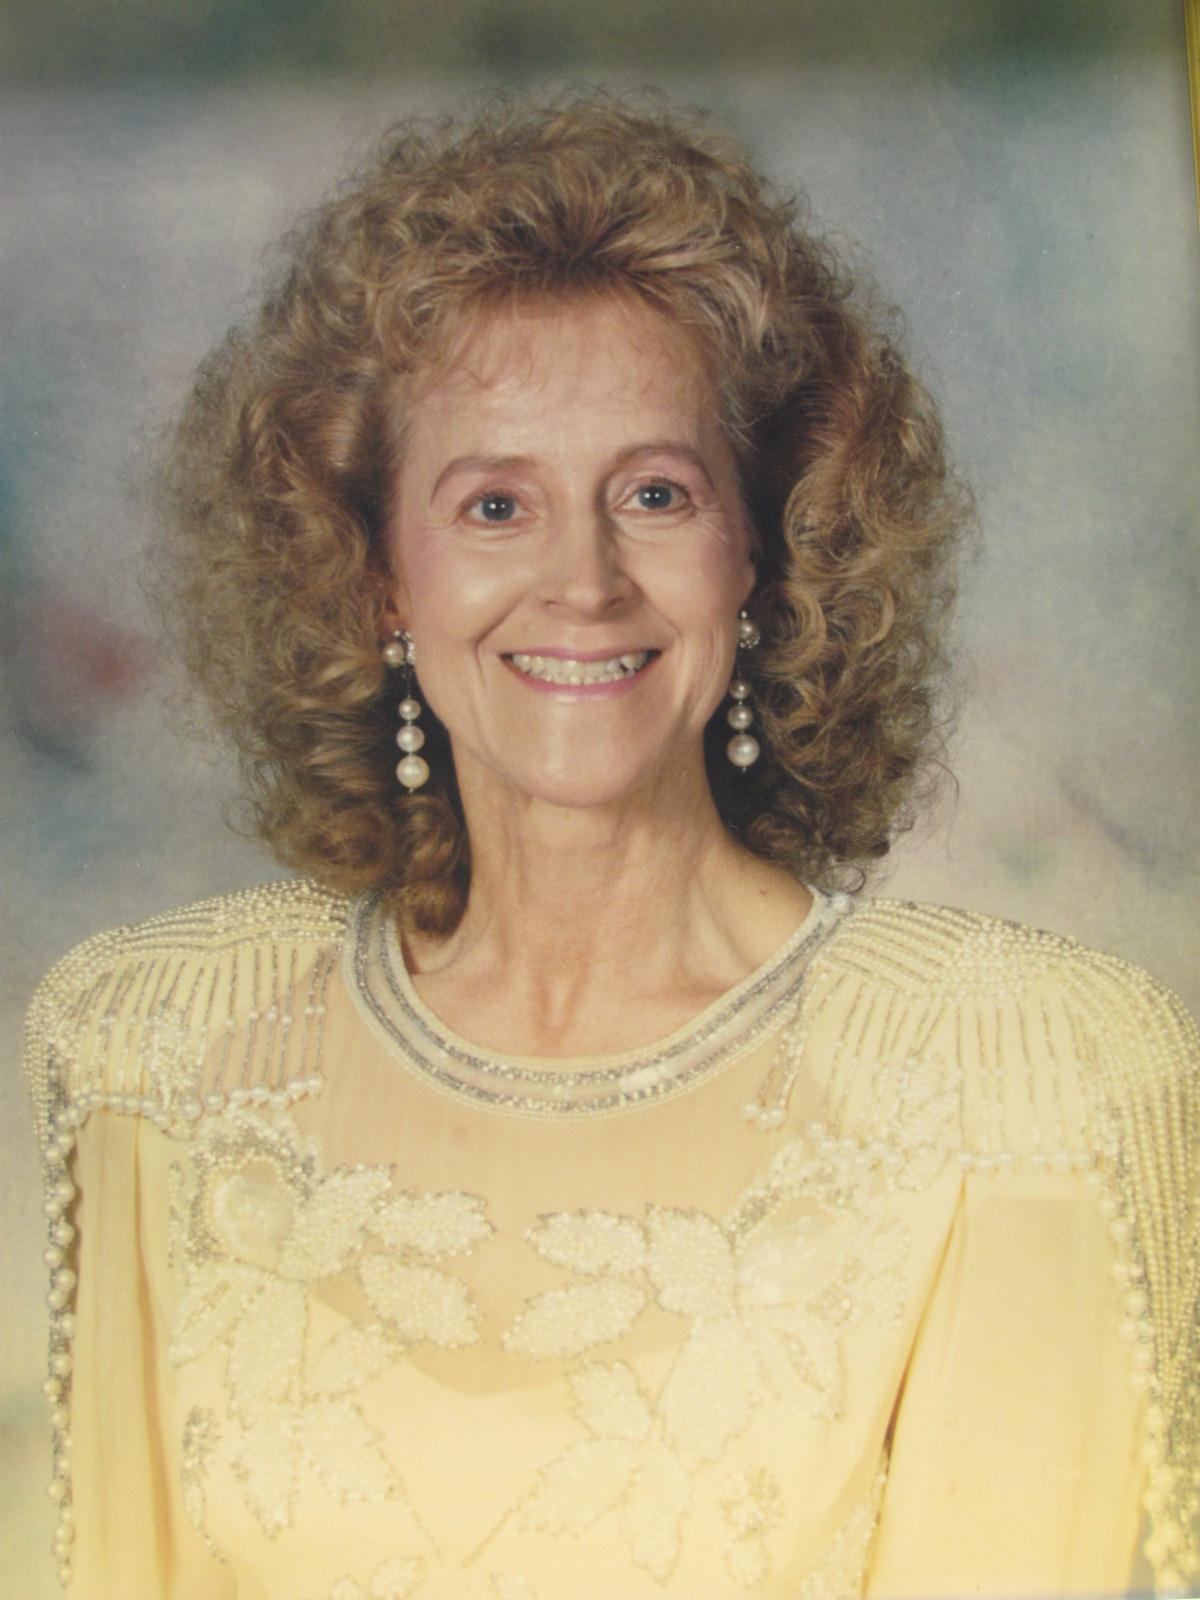 Janice L. Miller, age 77, of Huntingburg